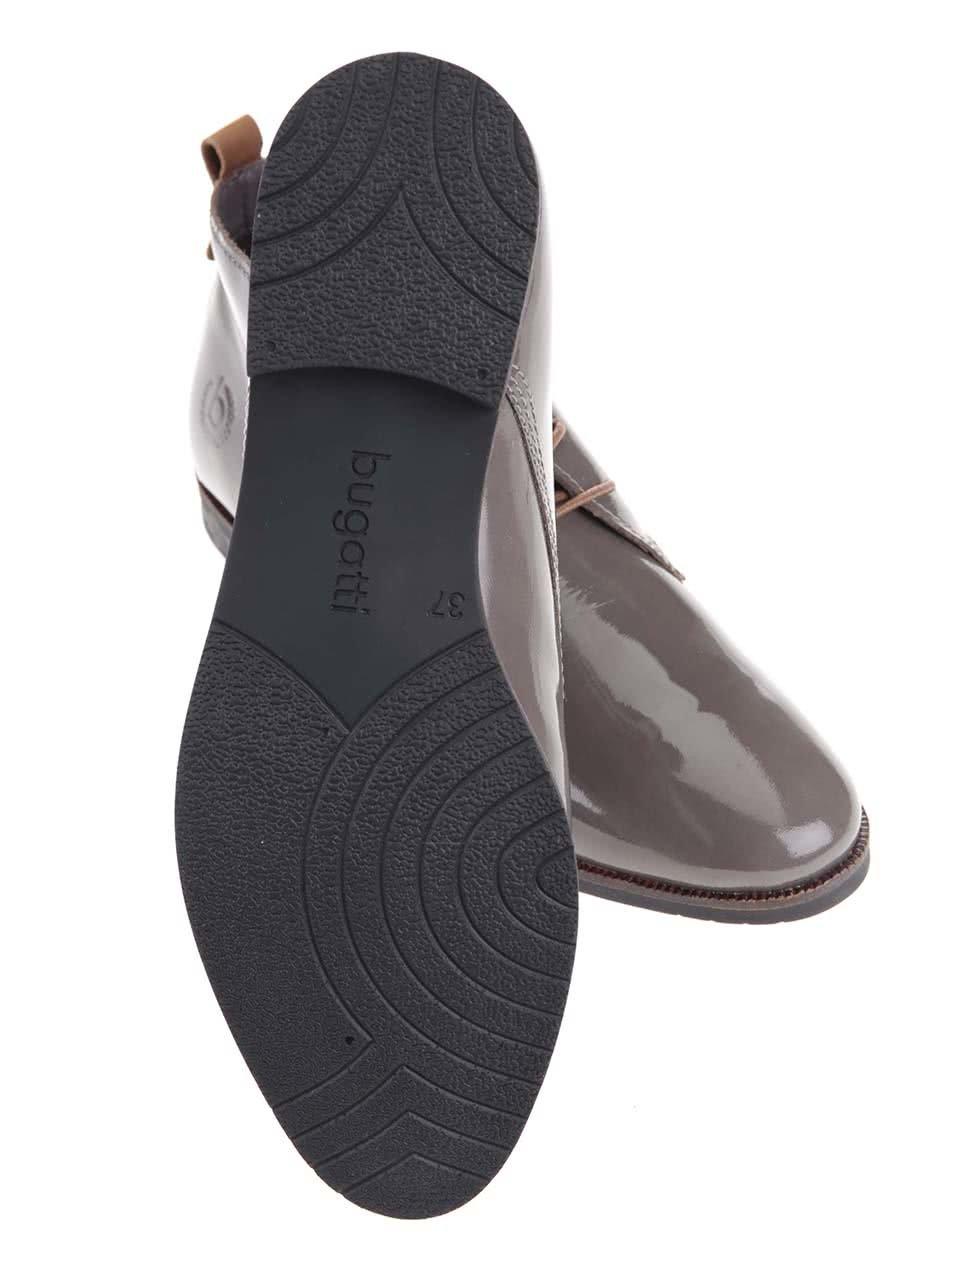 875da065a4 Sivé dámske kožené lesklé topánky bugatti Faith ...